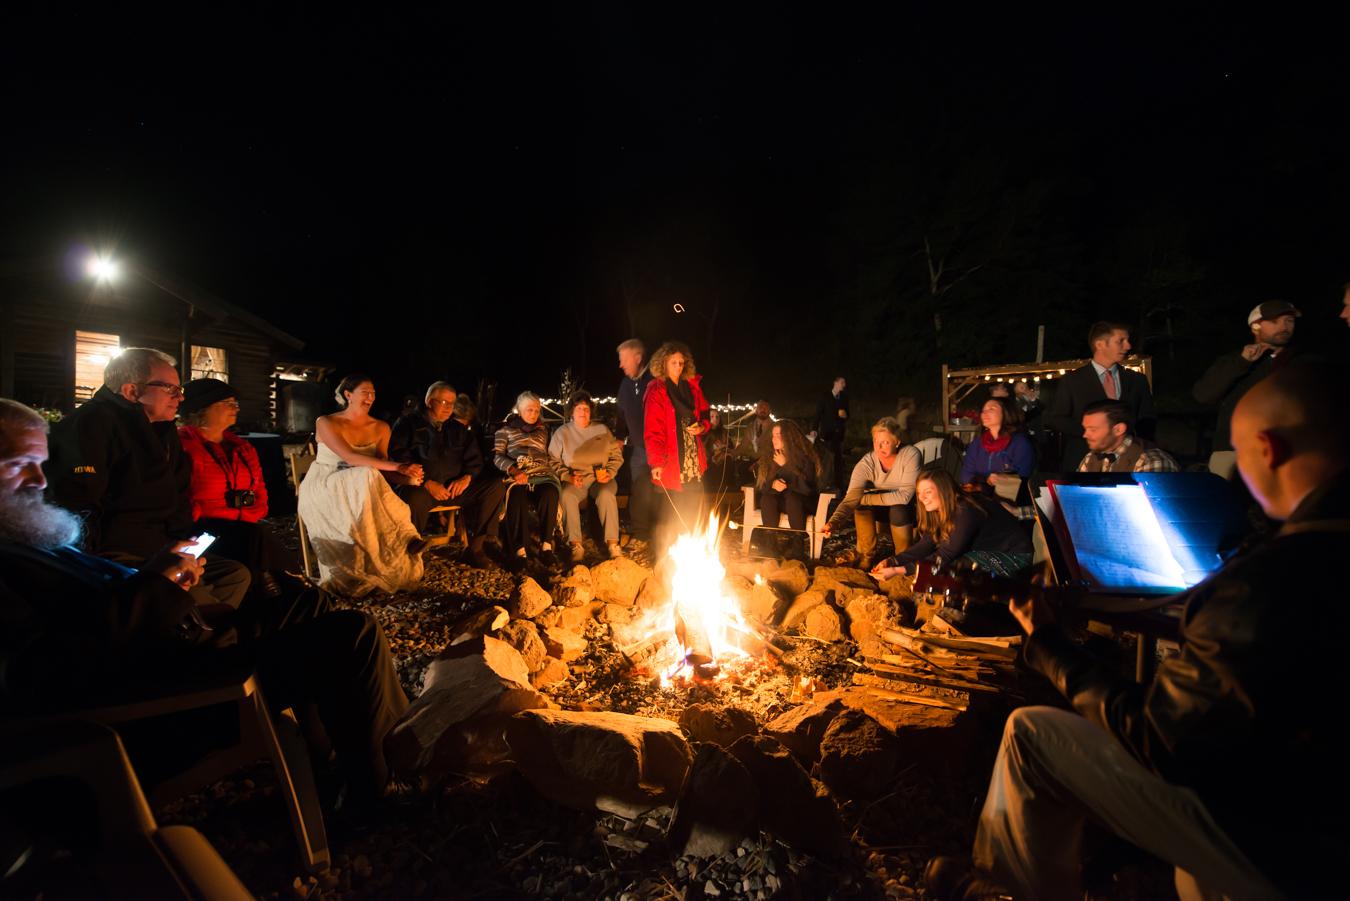 Bearcat-Stables-Wedding-Reception-Campfire-Night-Photo.jpg